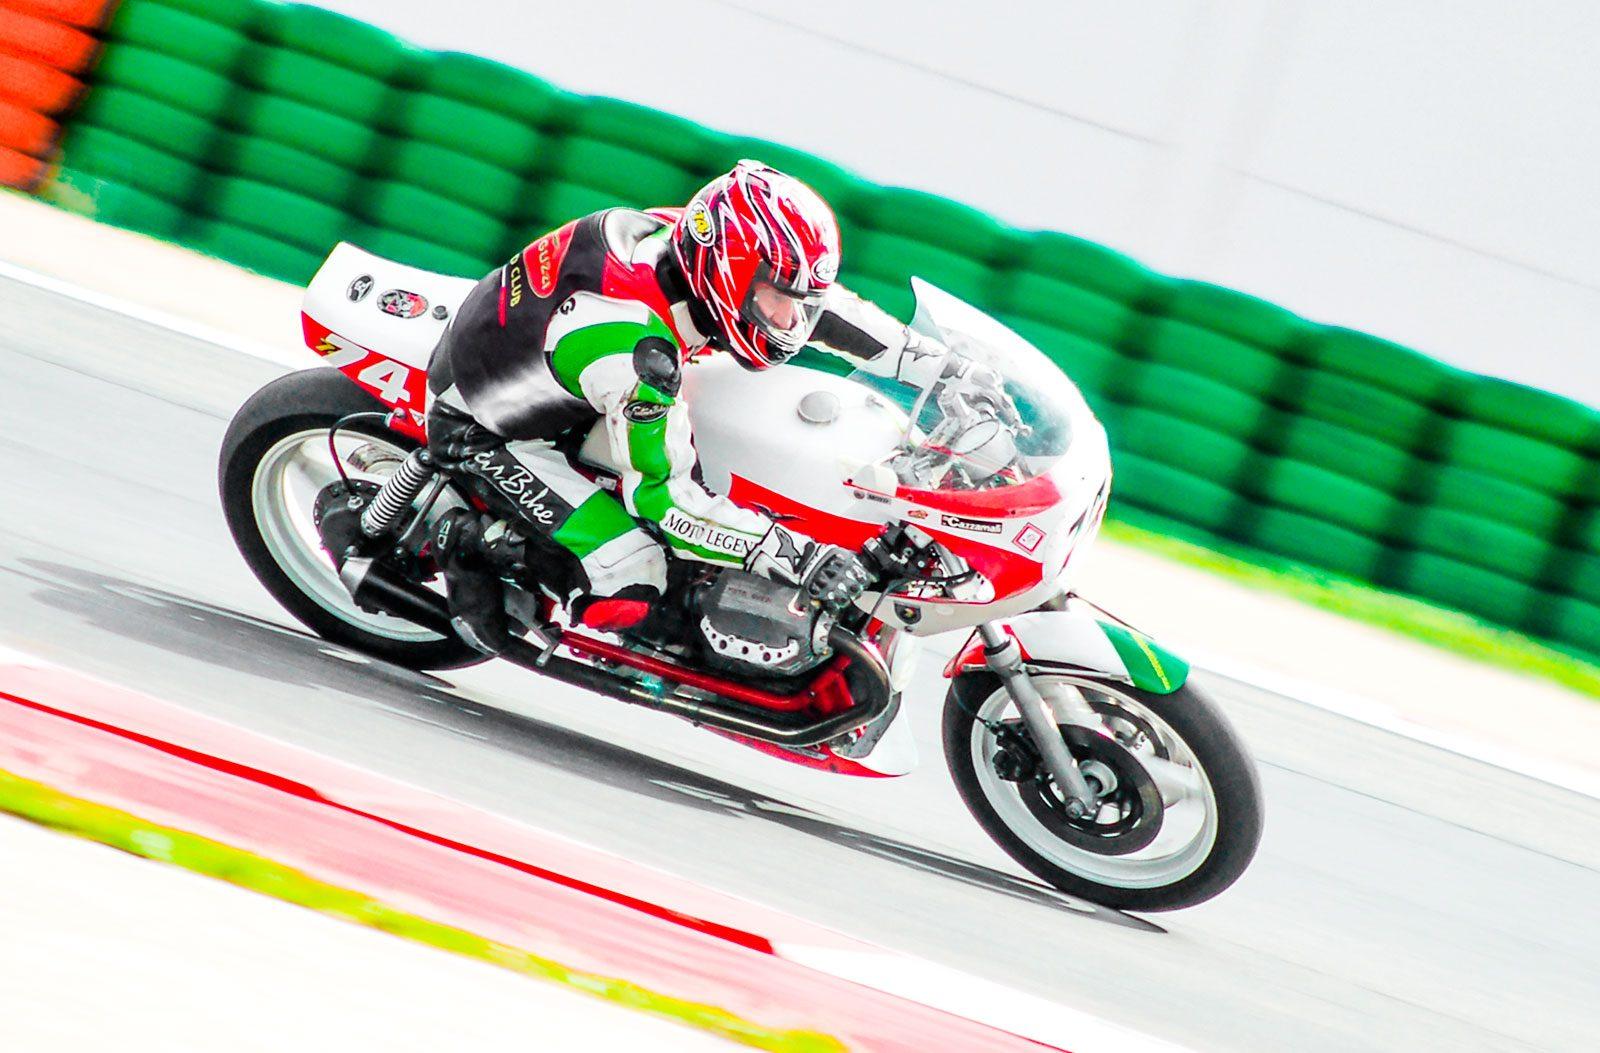 alberto sala writer pictures moto guzzi motorcycles endurance